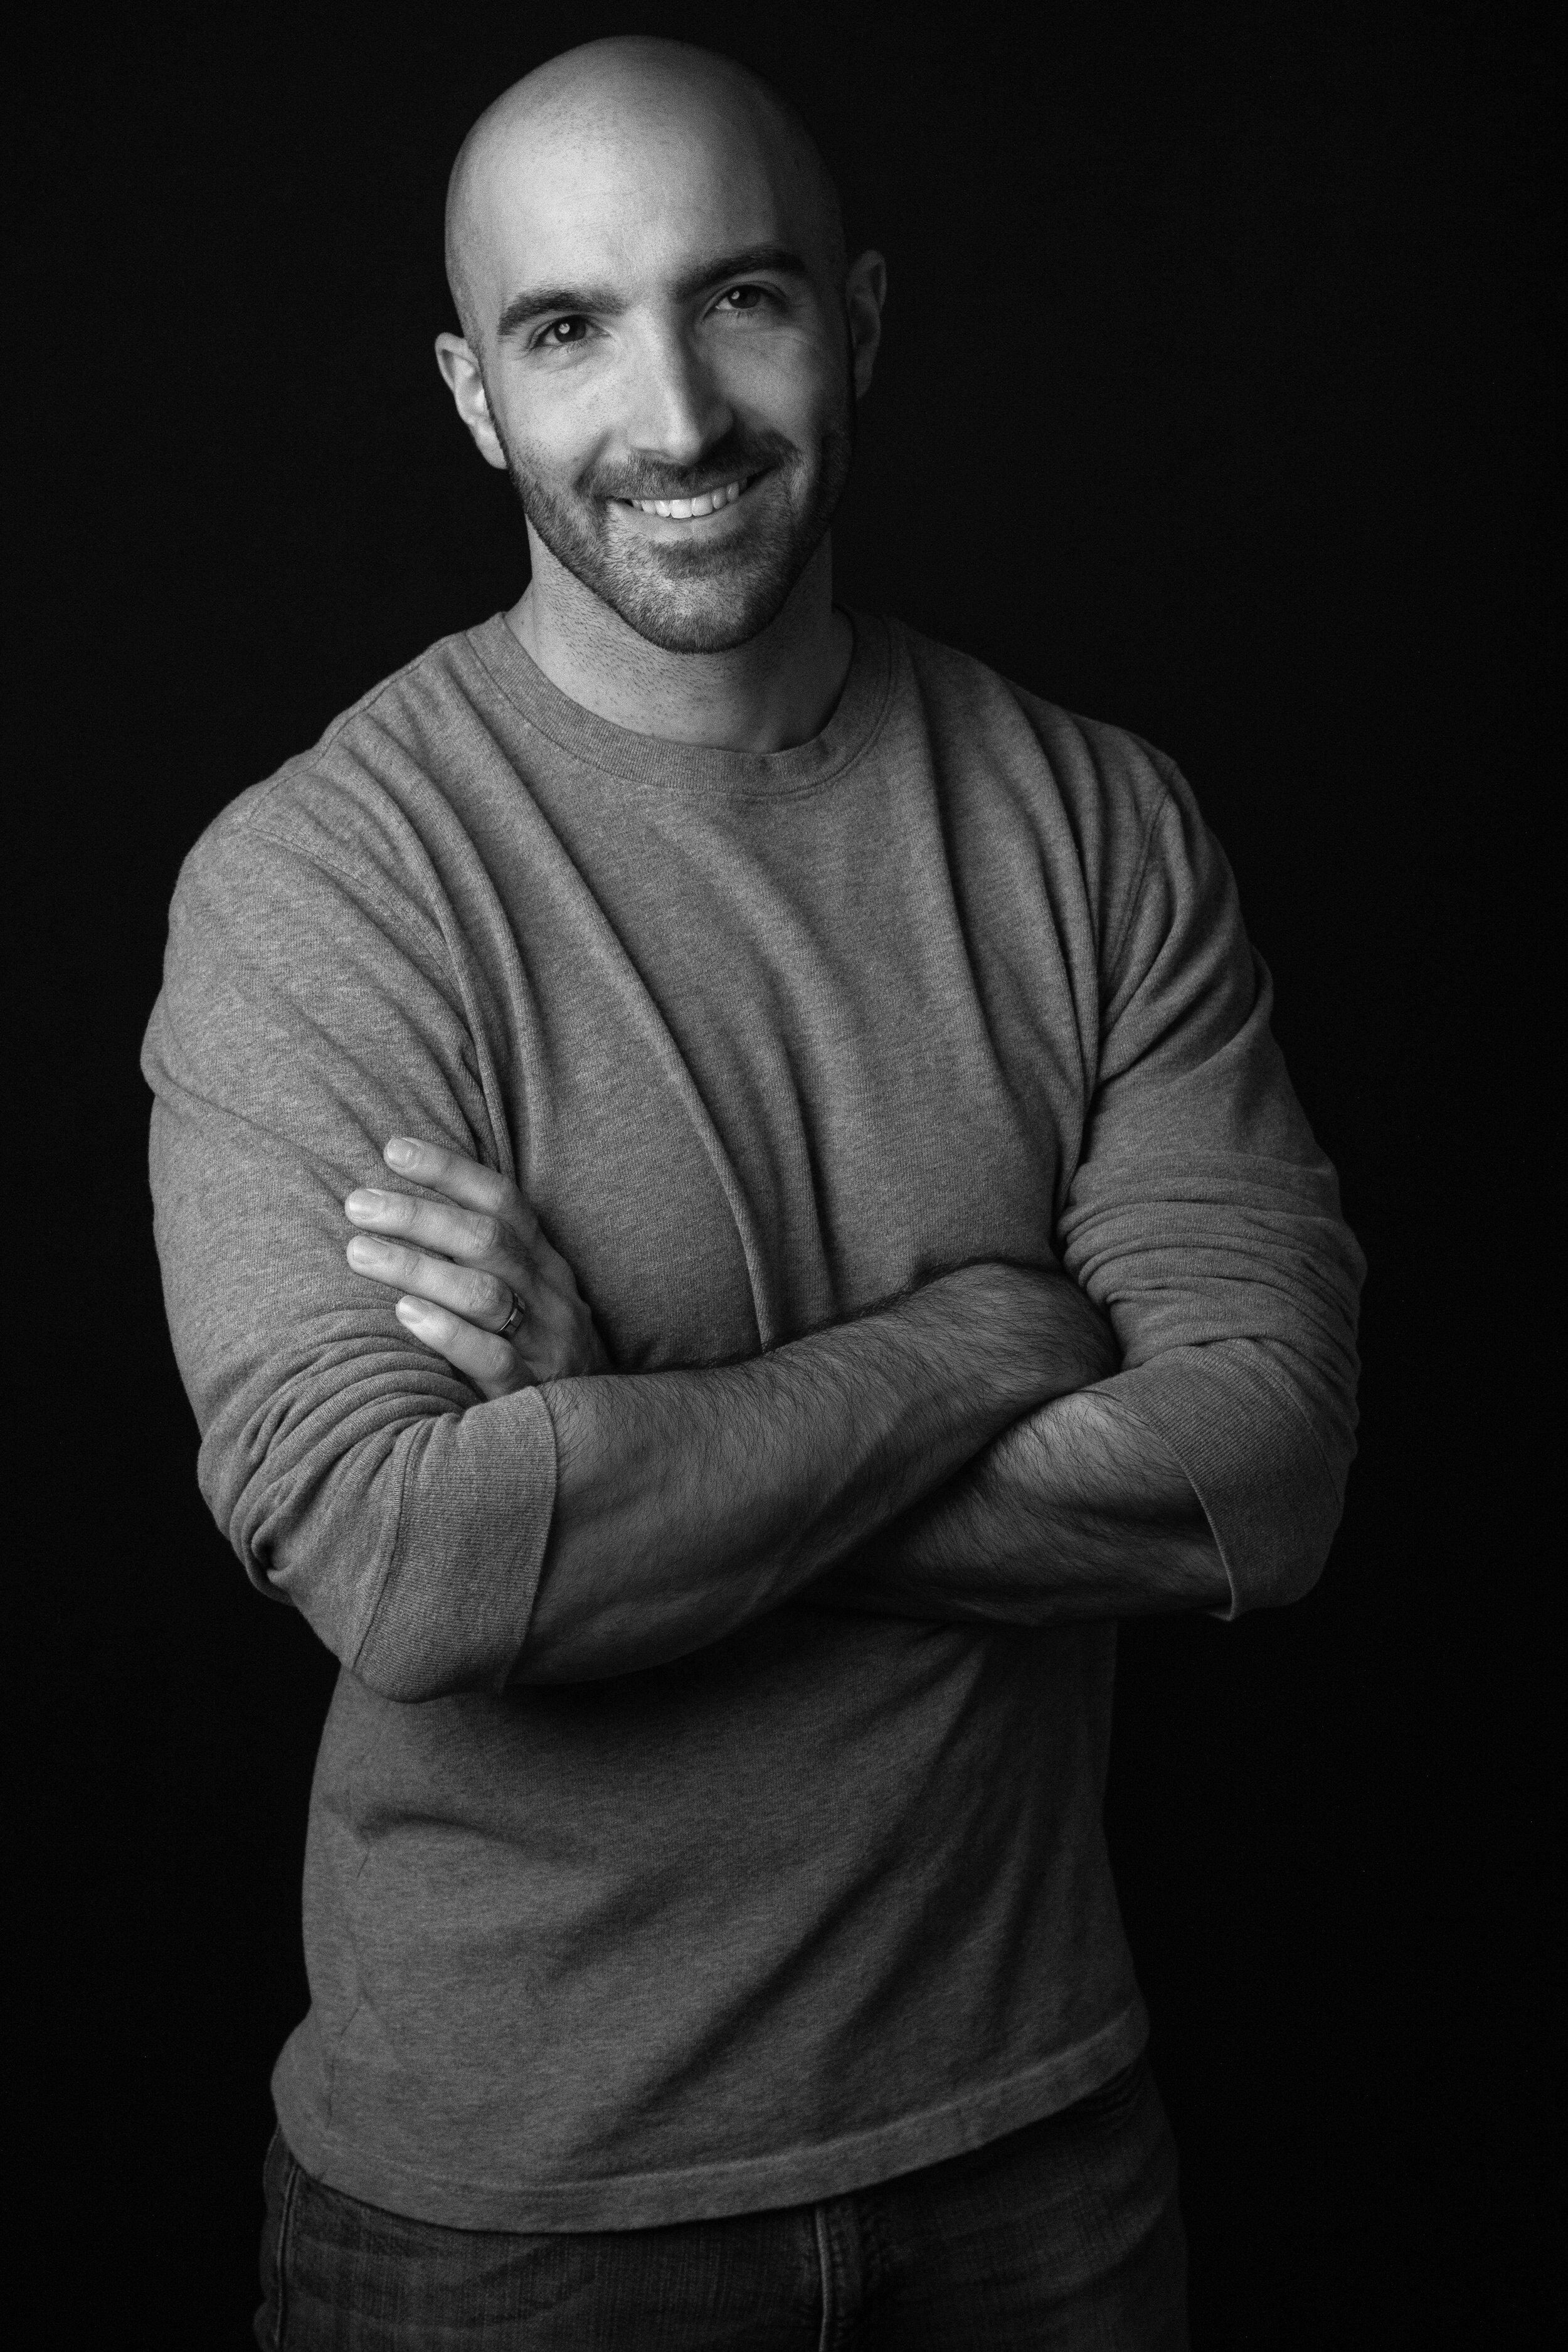 Ari Rosenberg, 2019